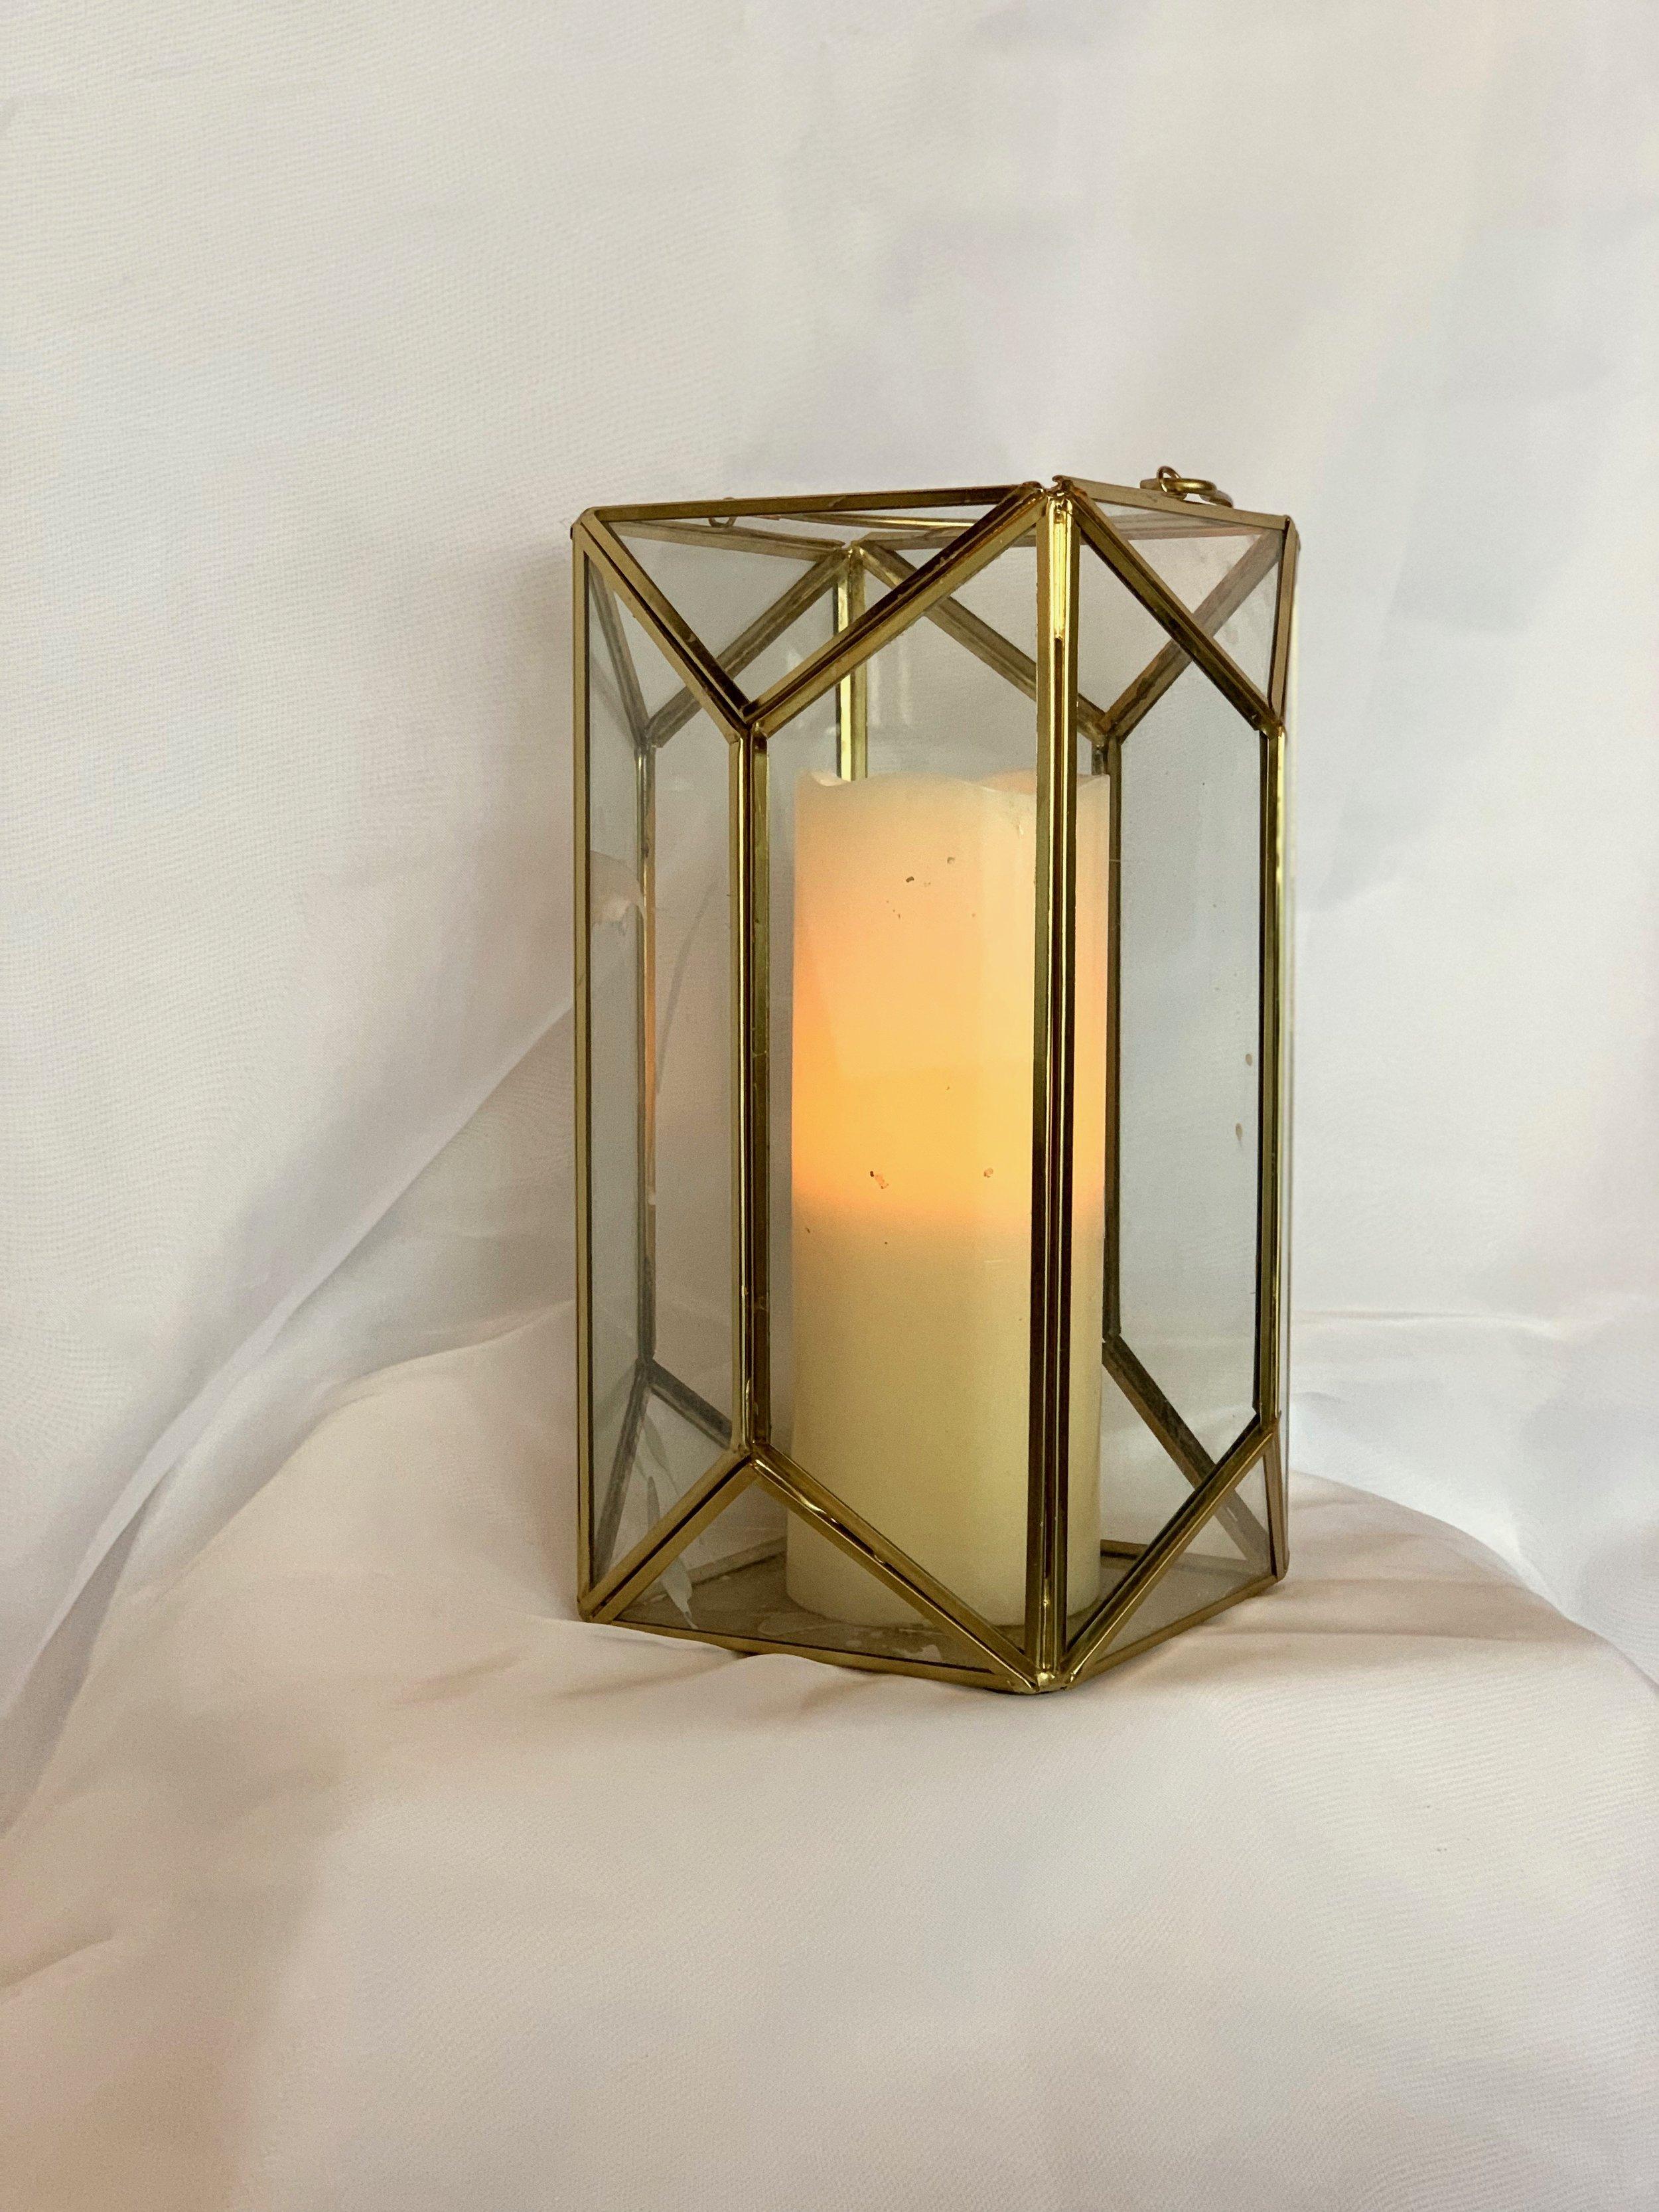 GOLD GEOMETRIC LANTERN W/ CANDLE $15.00